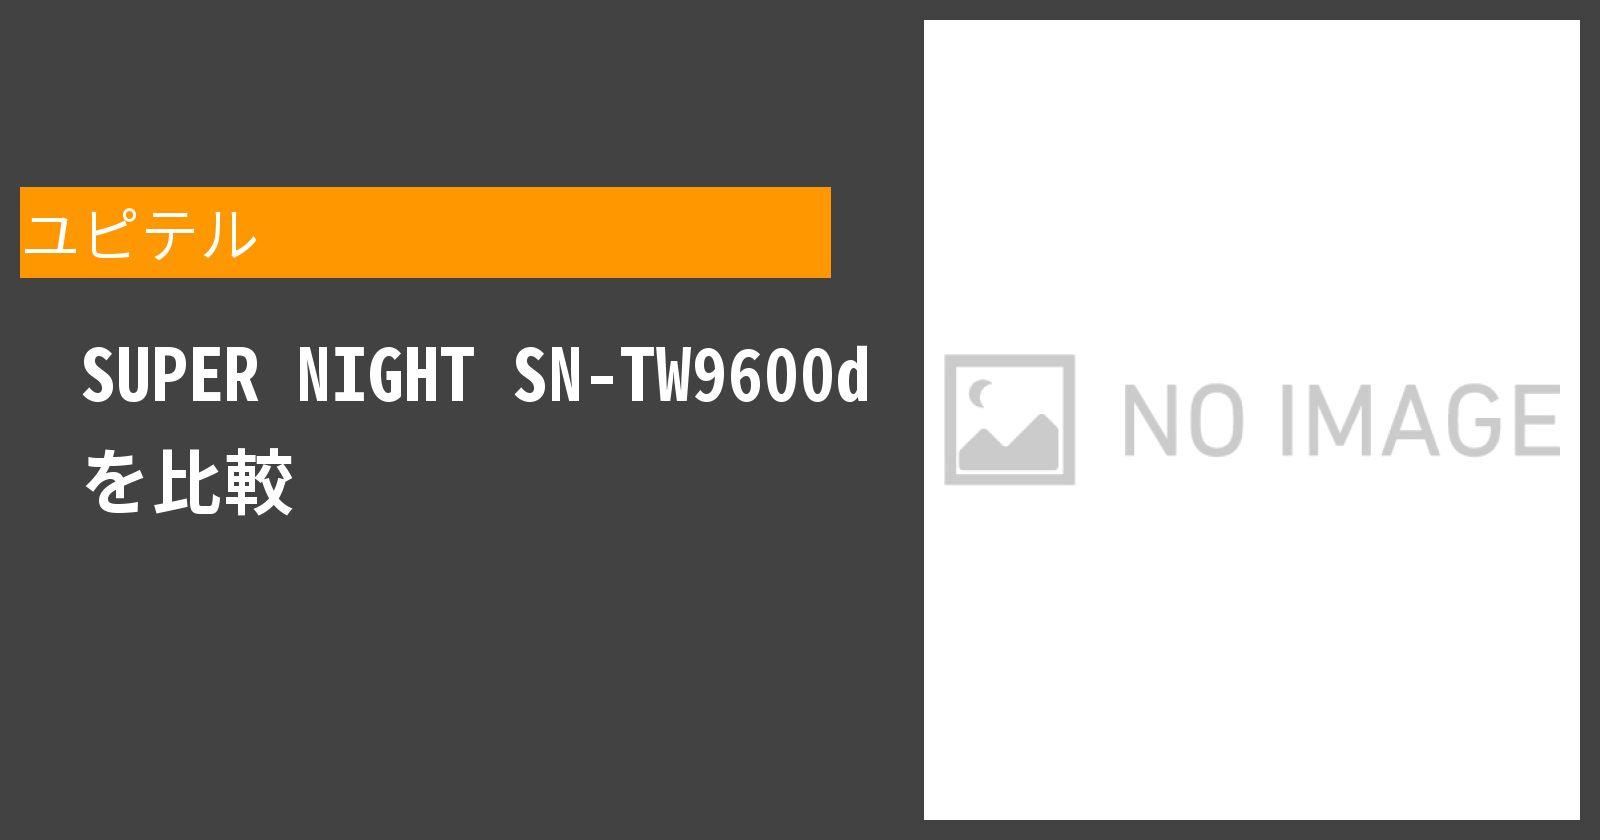 SUPER NIGHT SN-TW9600dを徹底評価